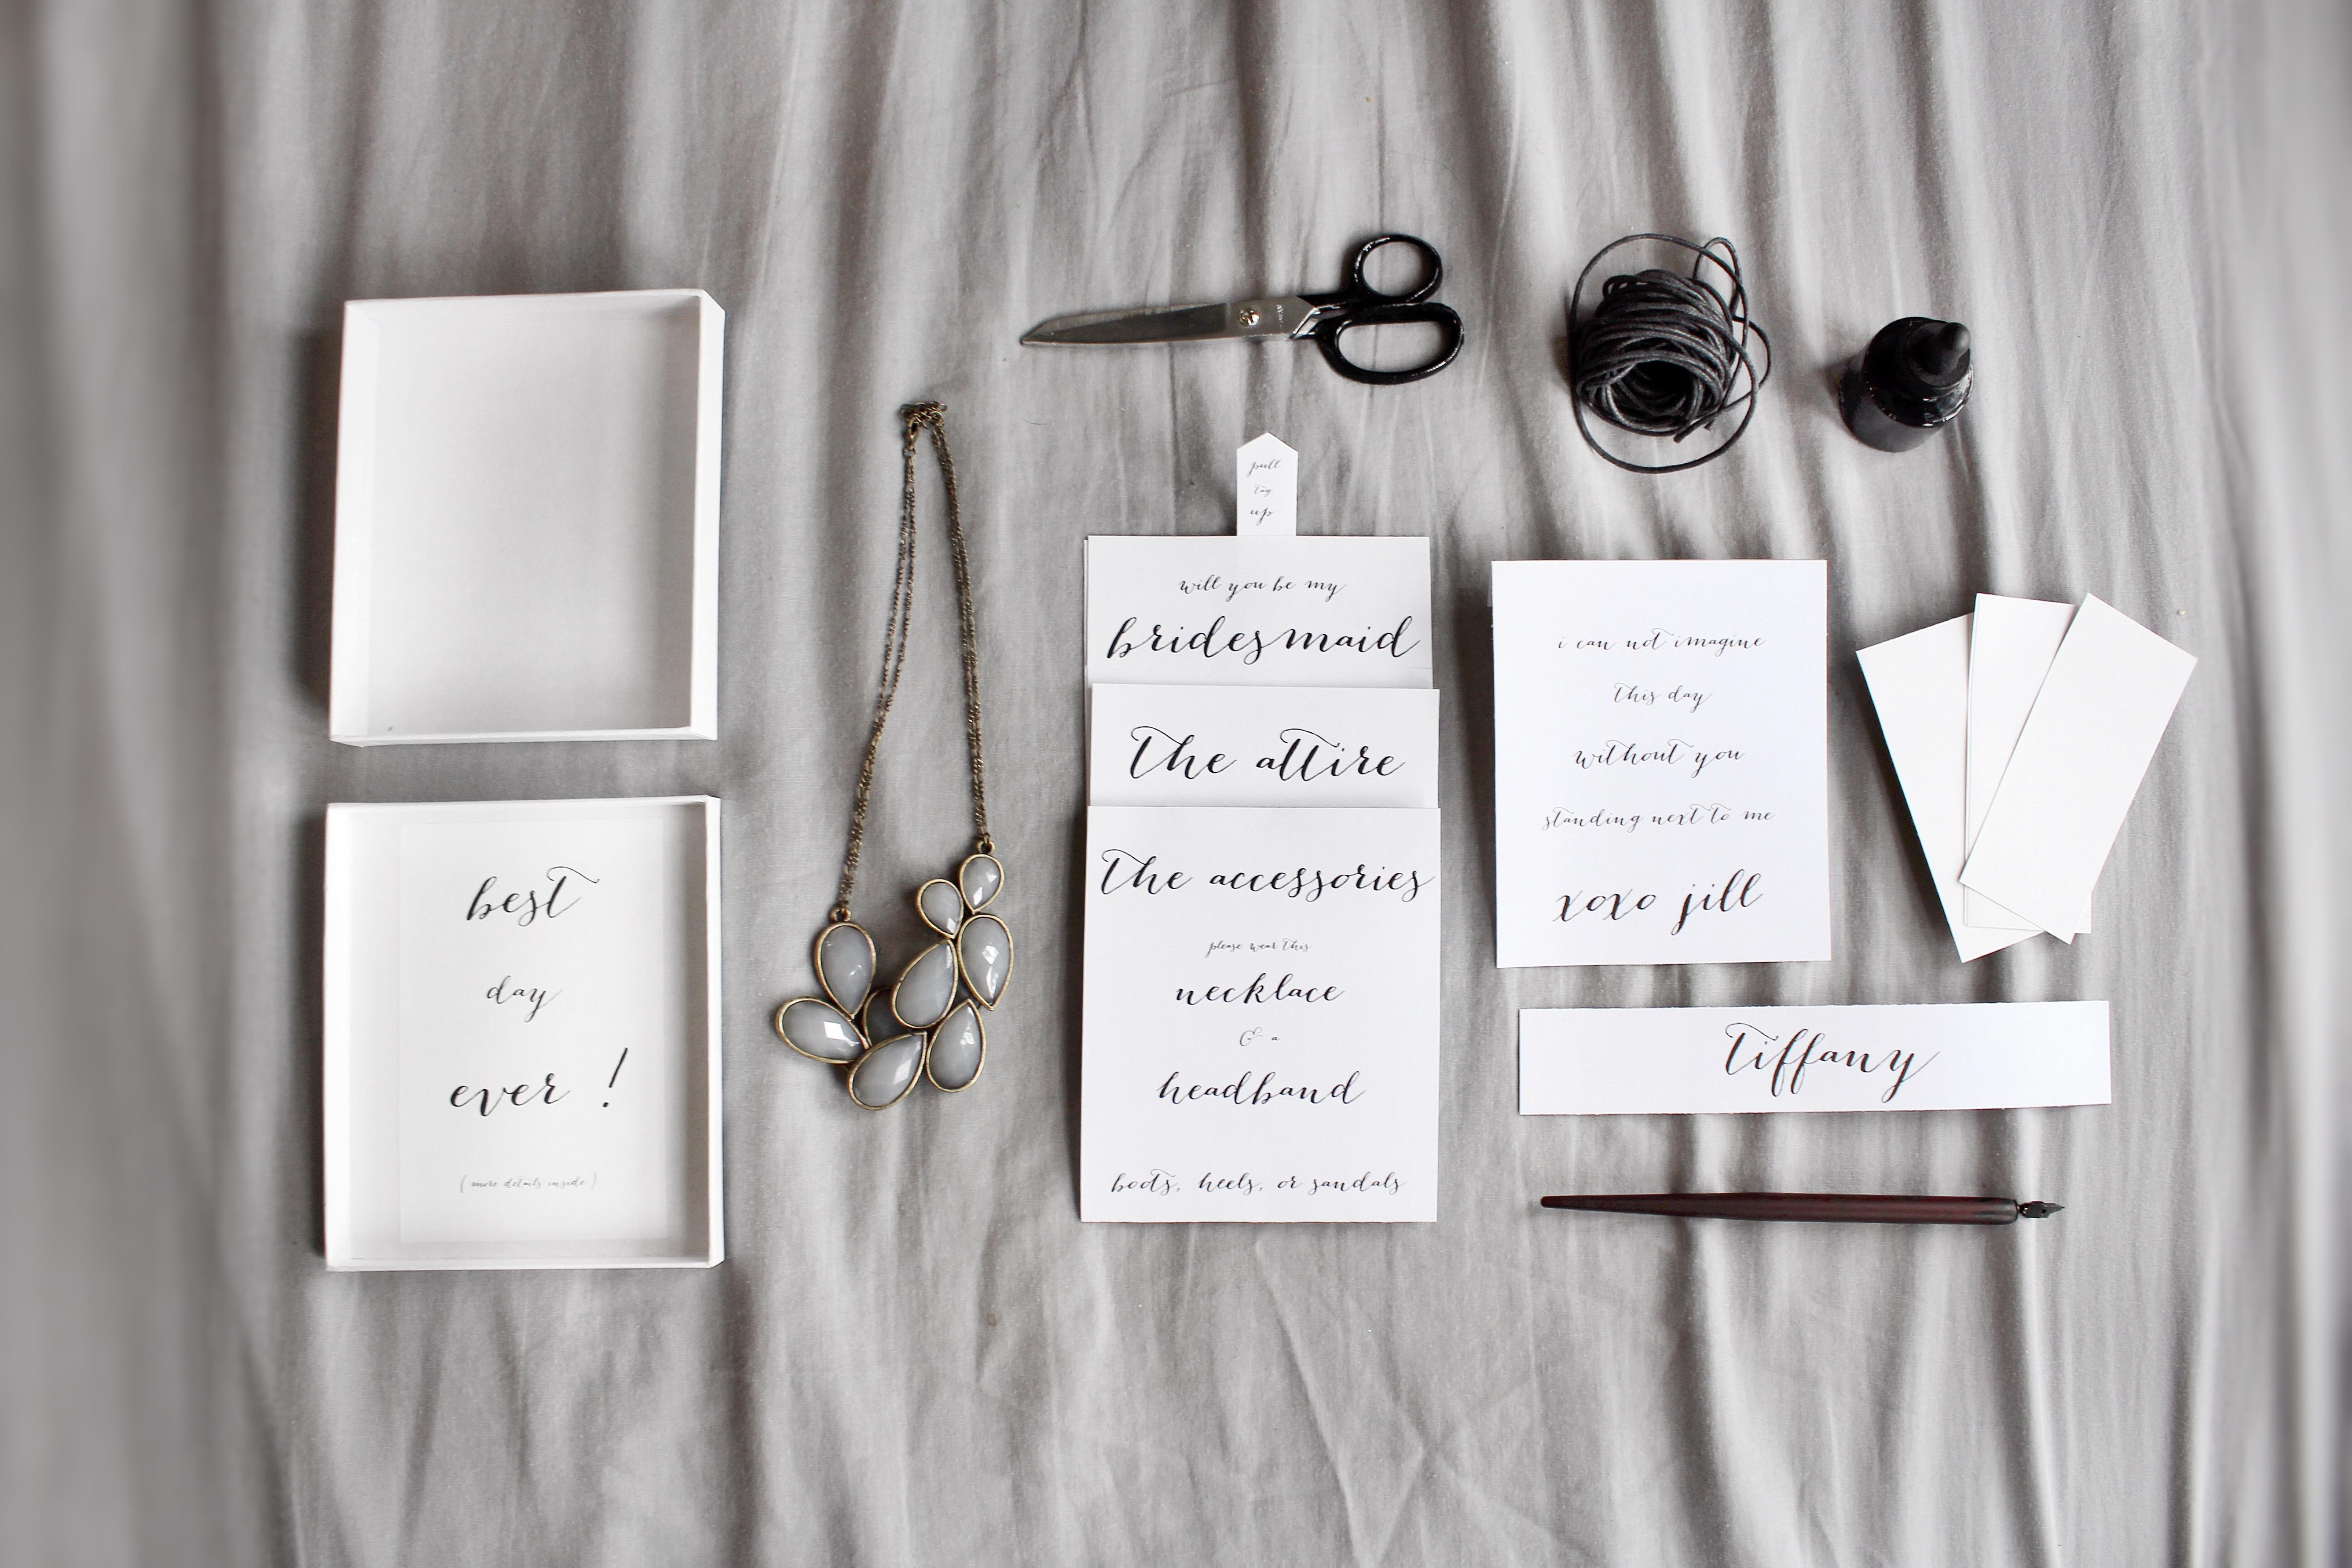 img_2800 unique bridesmaid invites jill absten cox,Unique Bridesmaid Invitations